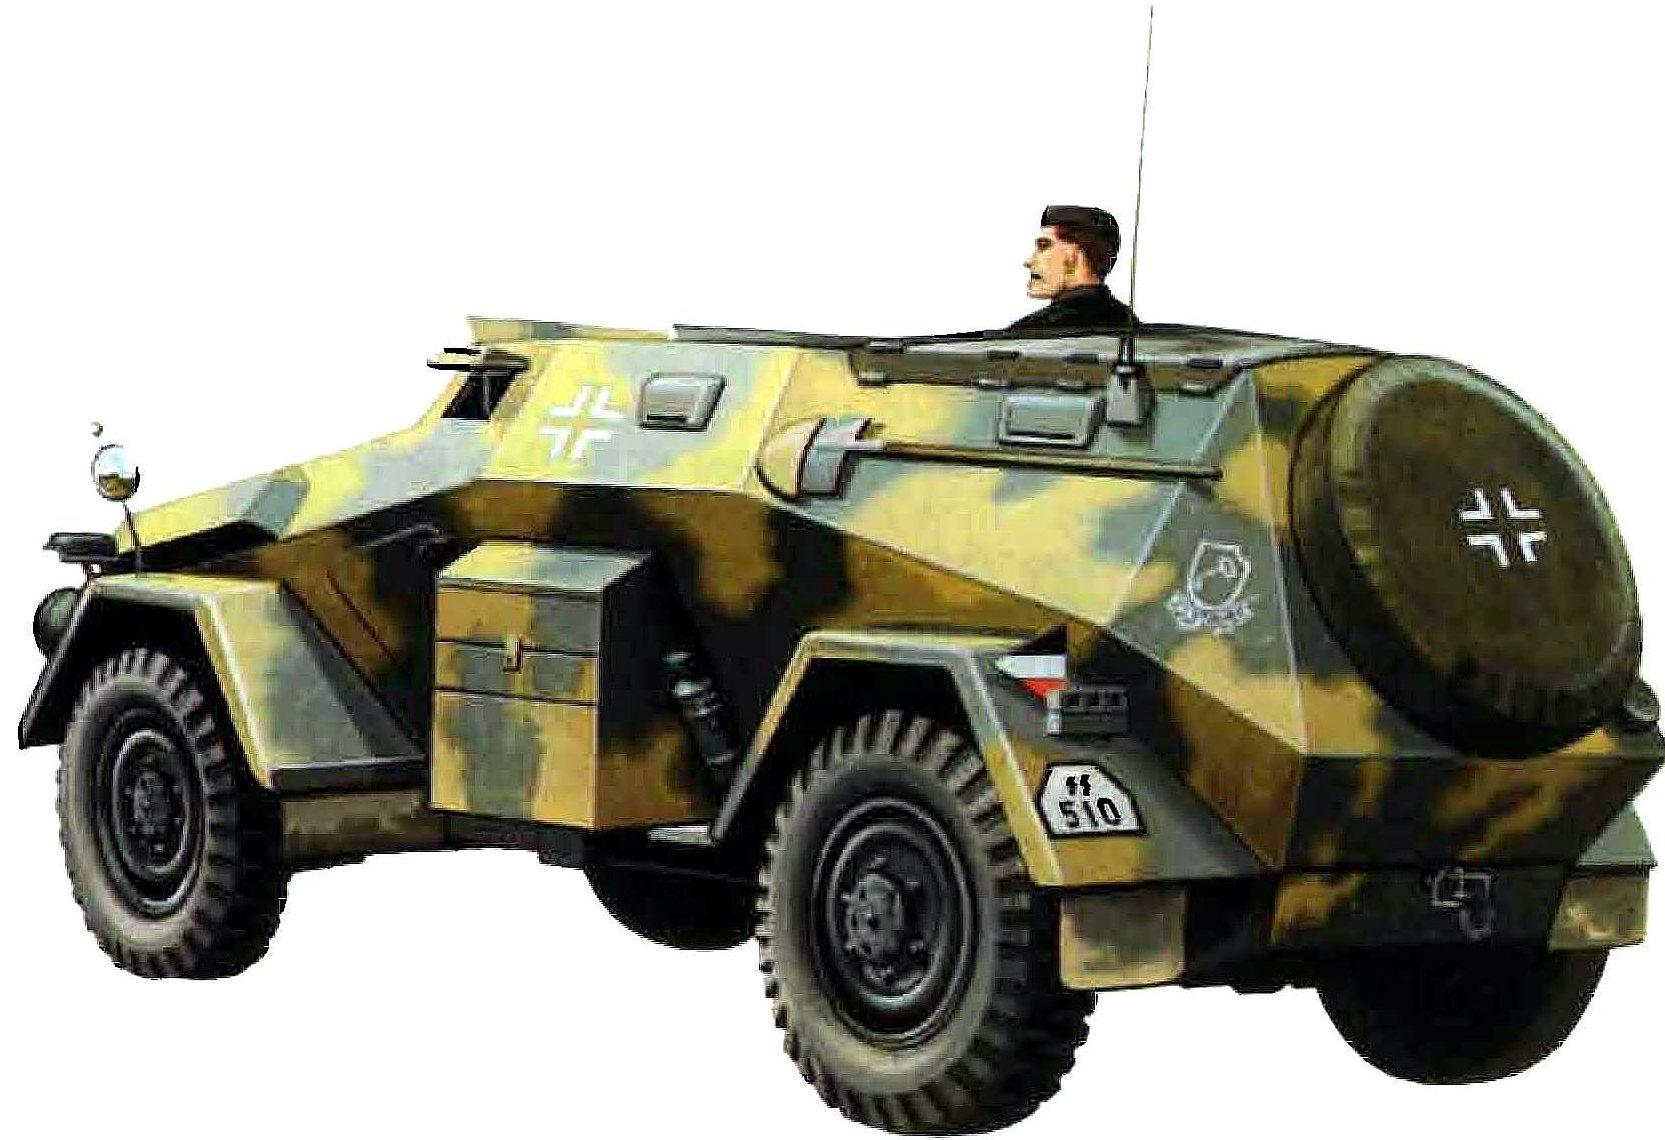 Greer Don. Бронеавтомобиль Sd.kfz. 247.